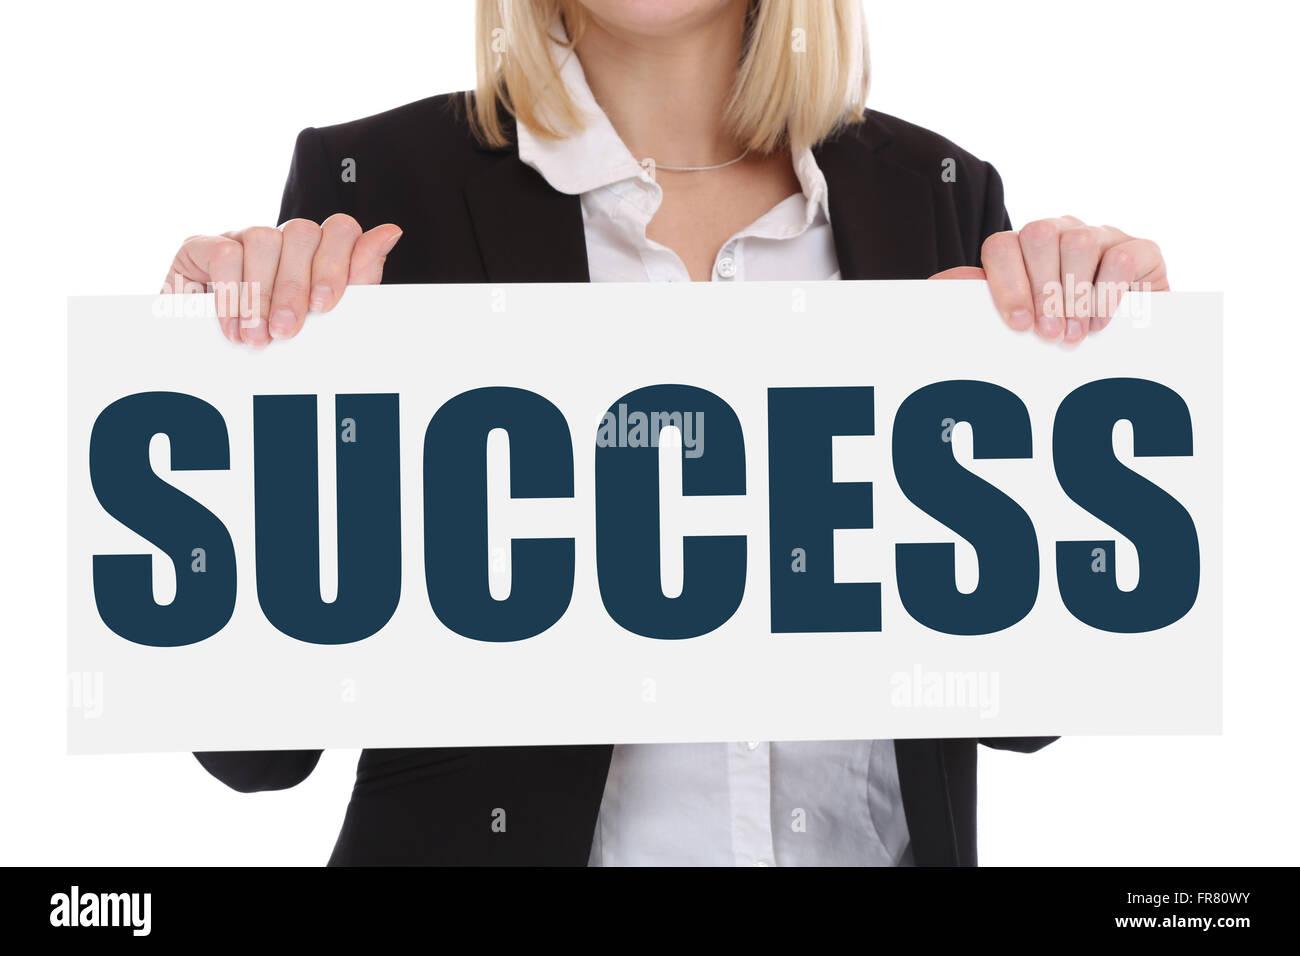 Success successful growth finances career business concept leadership achievement - Stock Image